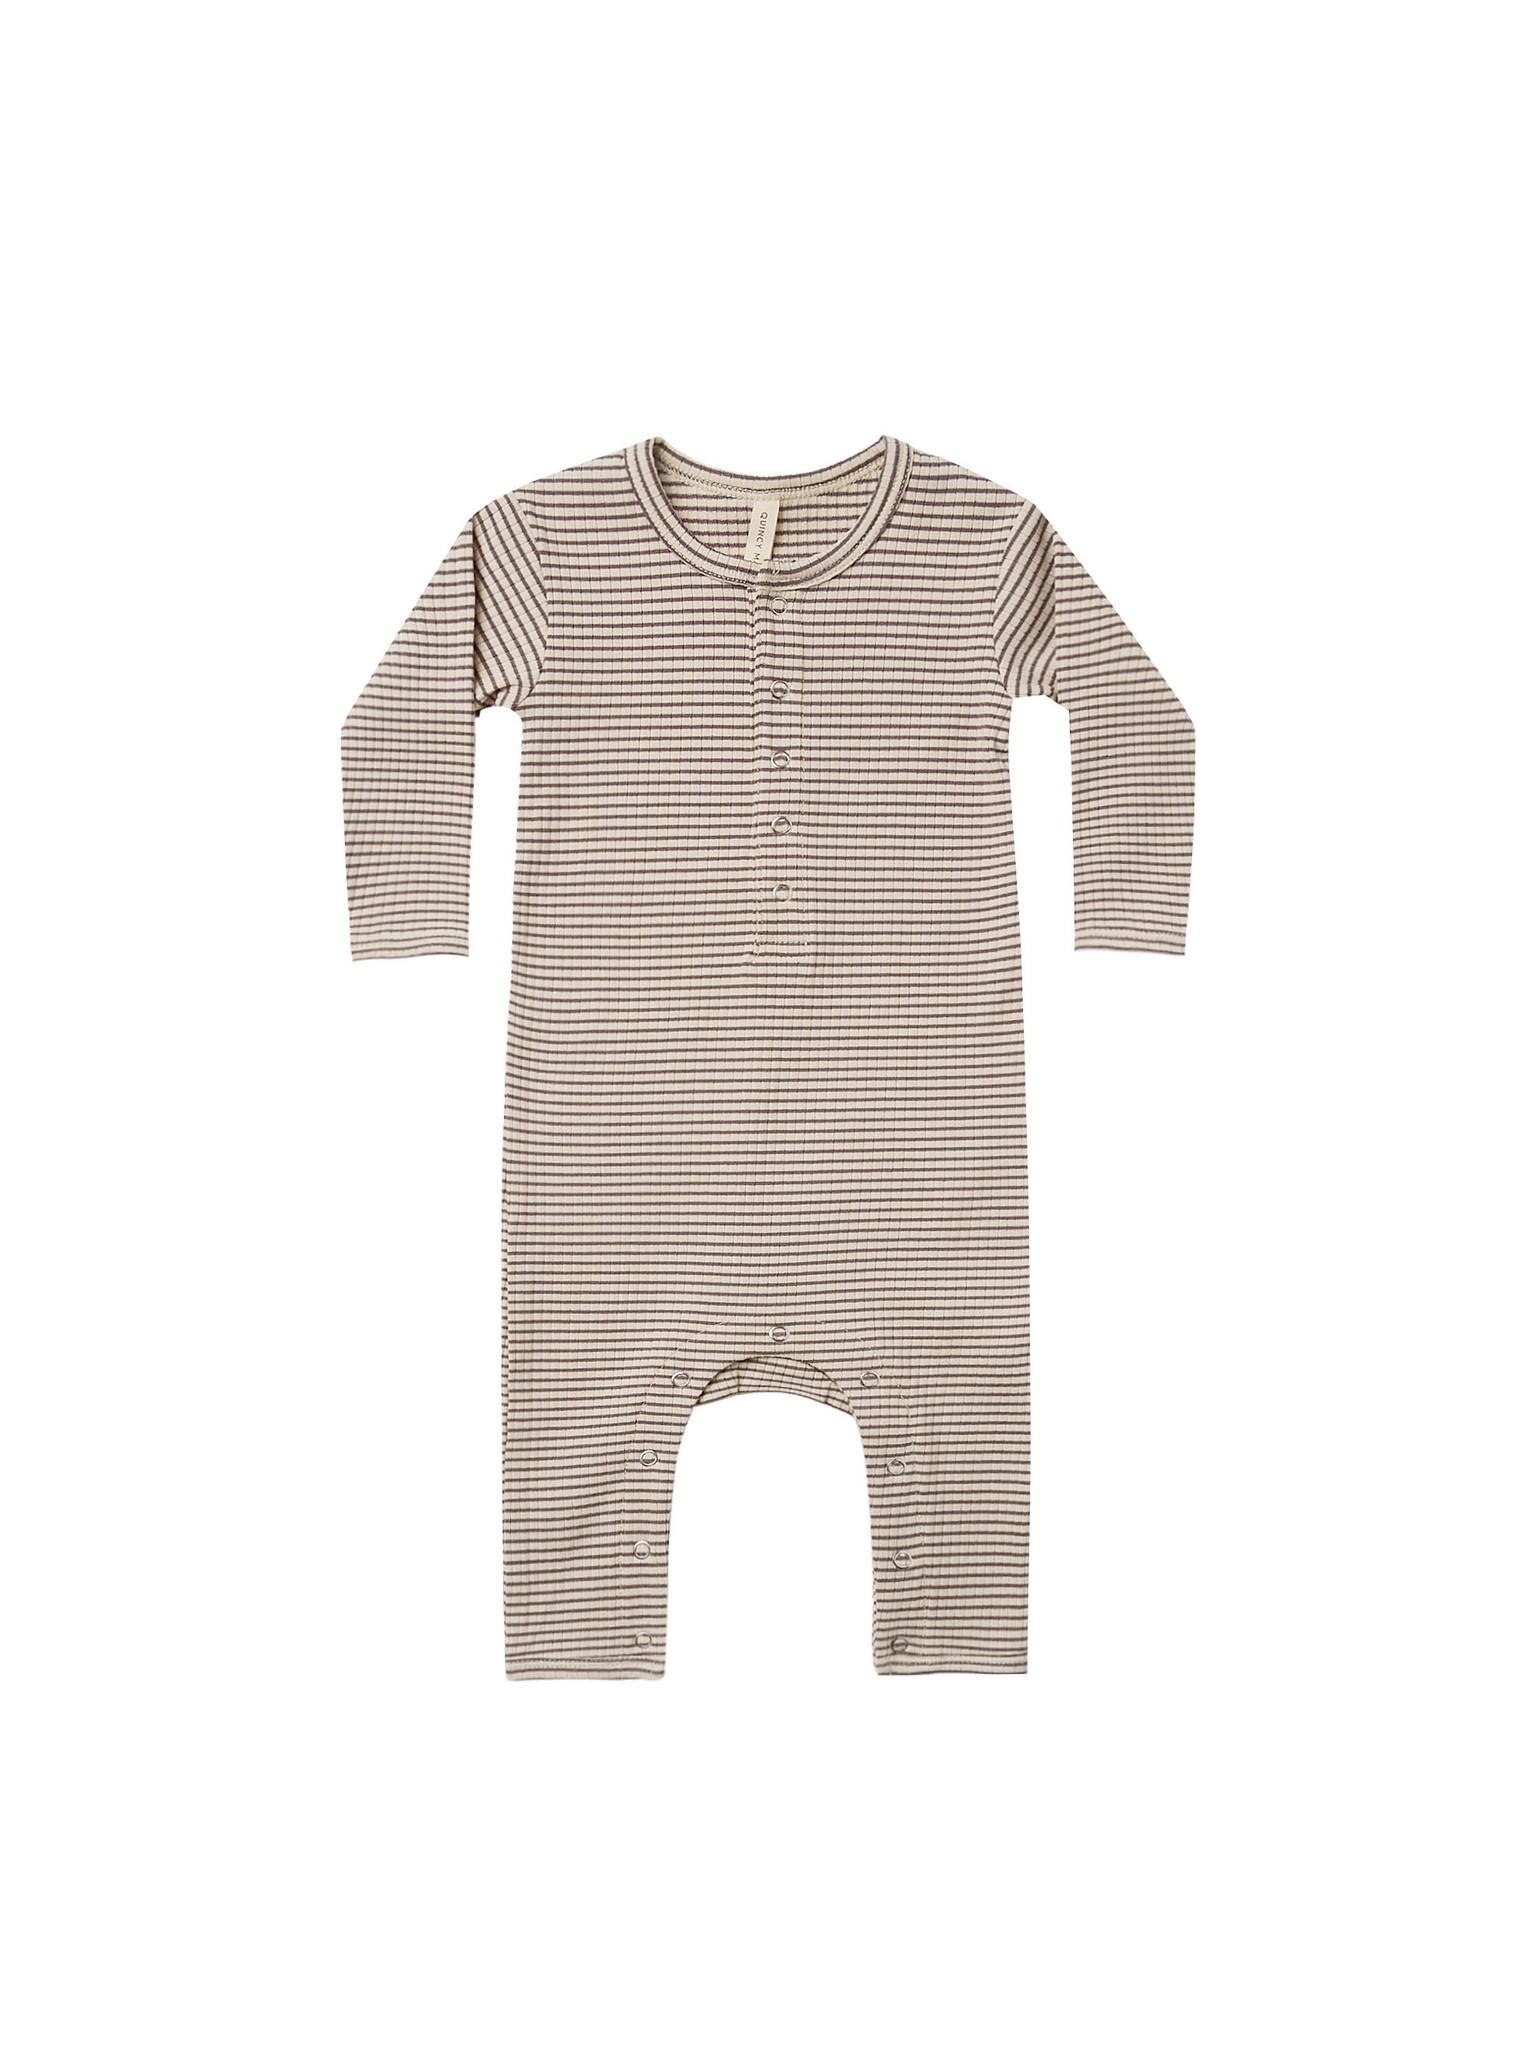 Quincy Mae - QM QM BA - Charcoal Stripe Ribbed Baby Jumpsuit